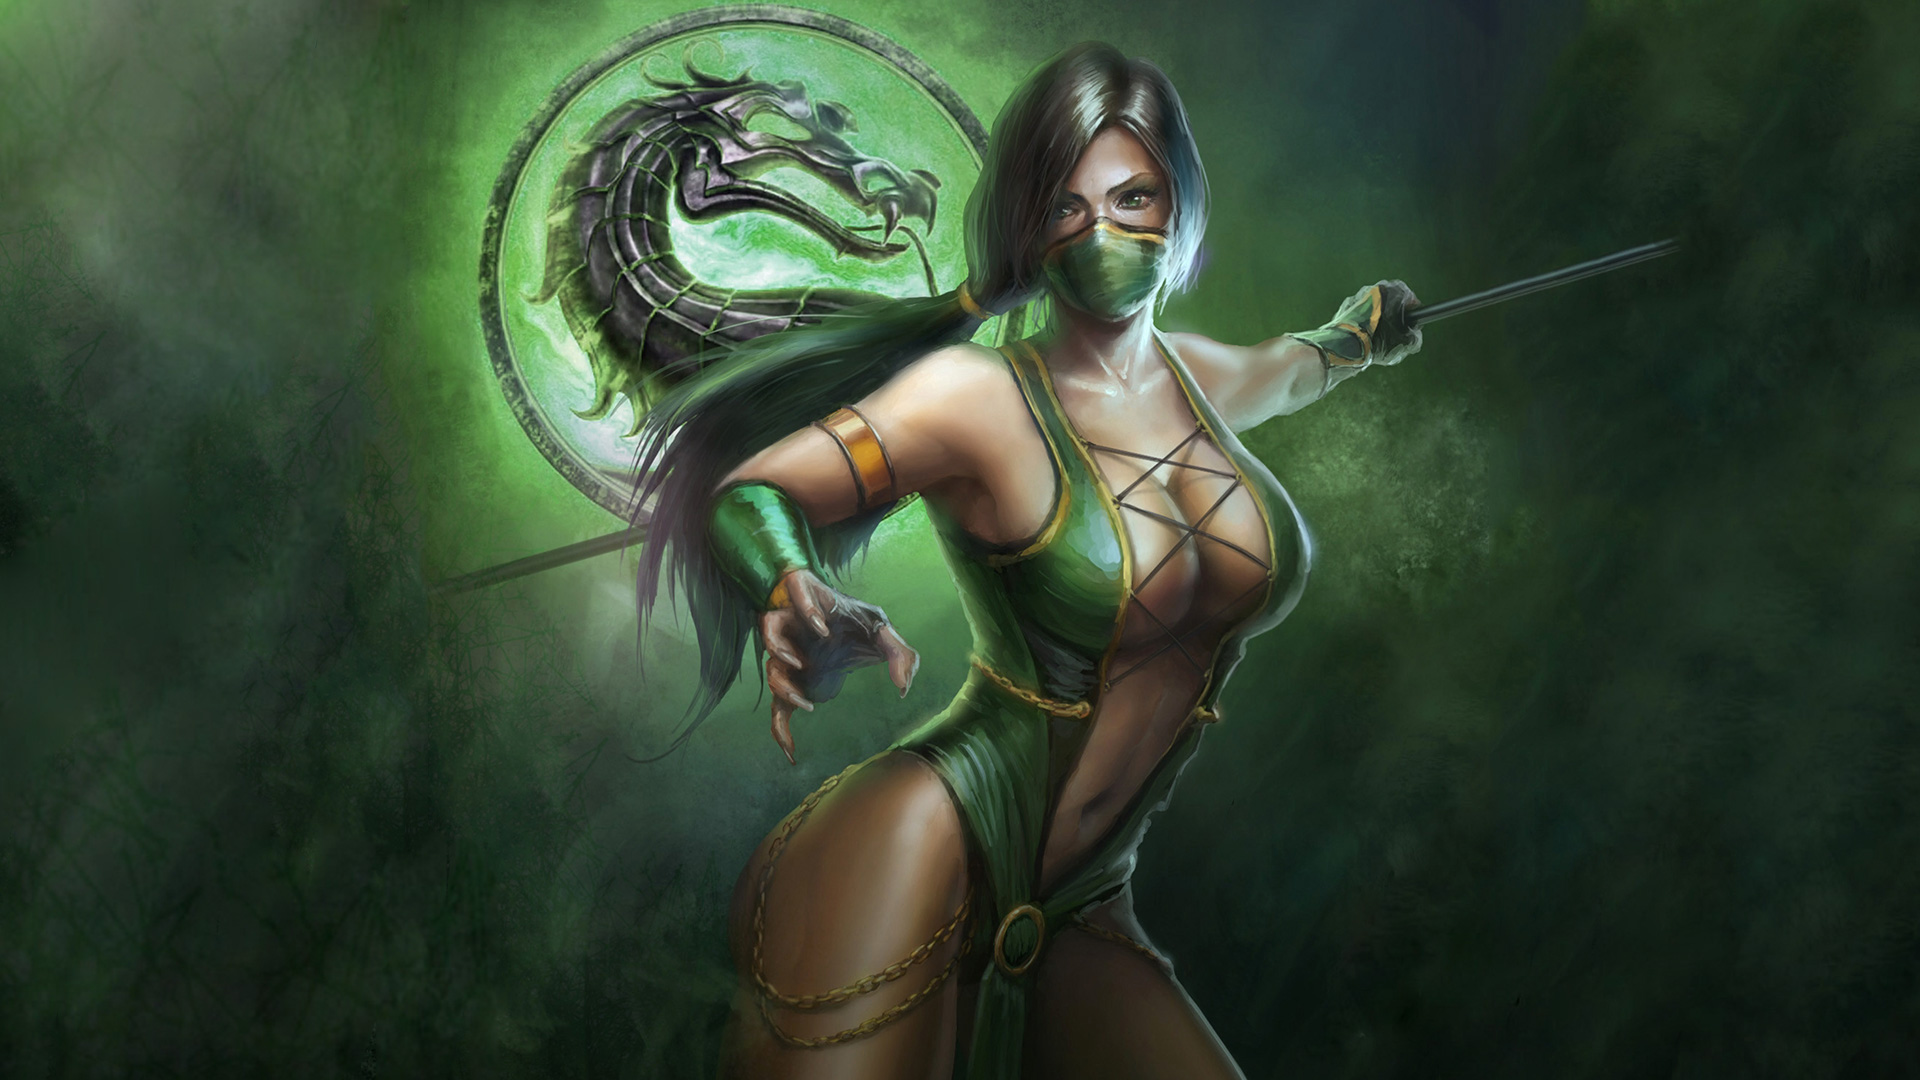 Mortal Kombat jade art